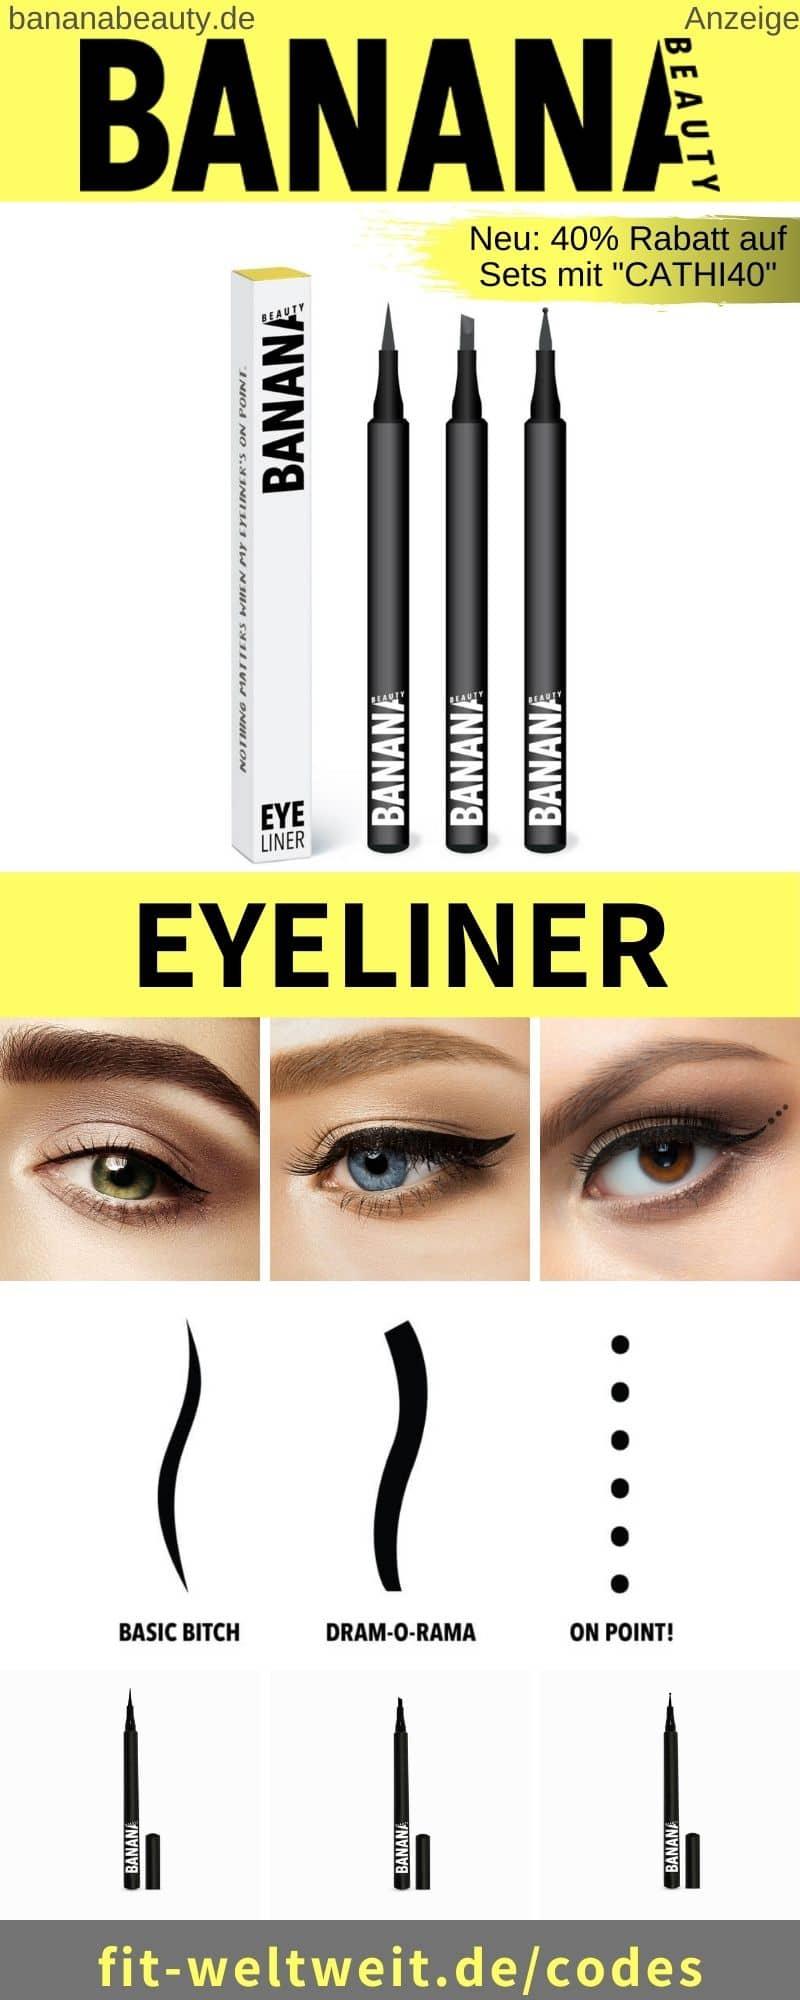 Banana Beauty Eyeliner Erfahrungen Basic Bitch, Drama O Rama, On Point!